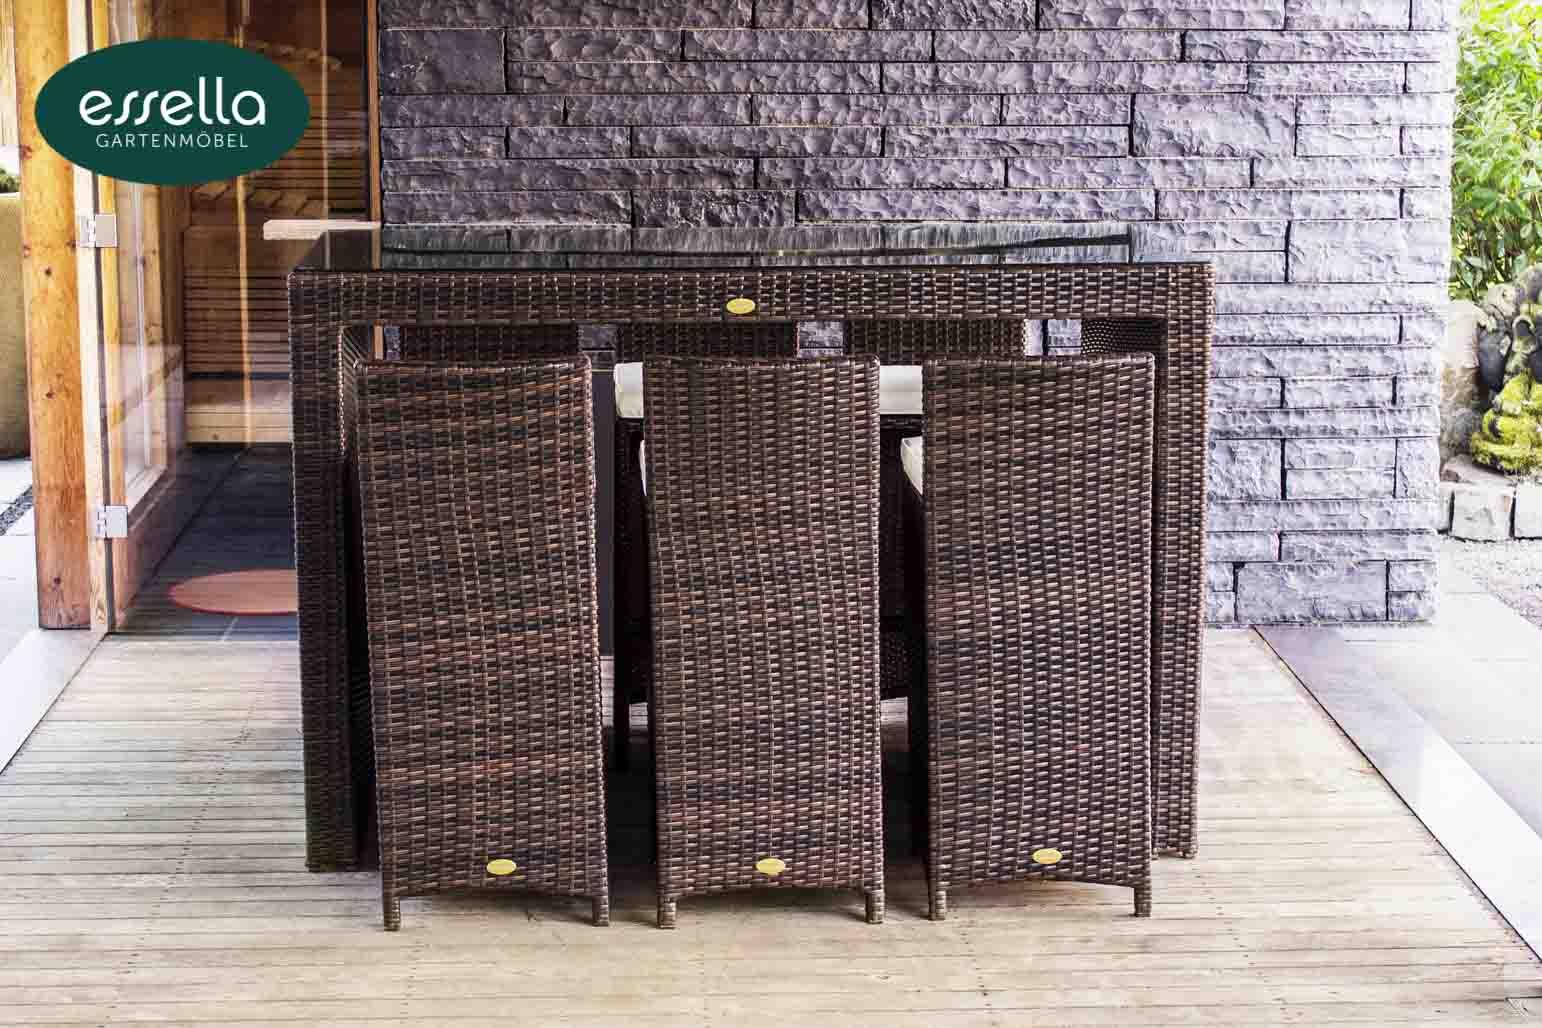 essella polyrattan bar set bari 6 personen flachgeflecht. Black Bedroom Furniture Sets. Home Design Ideas